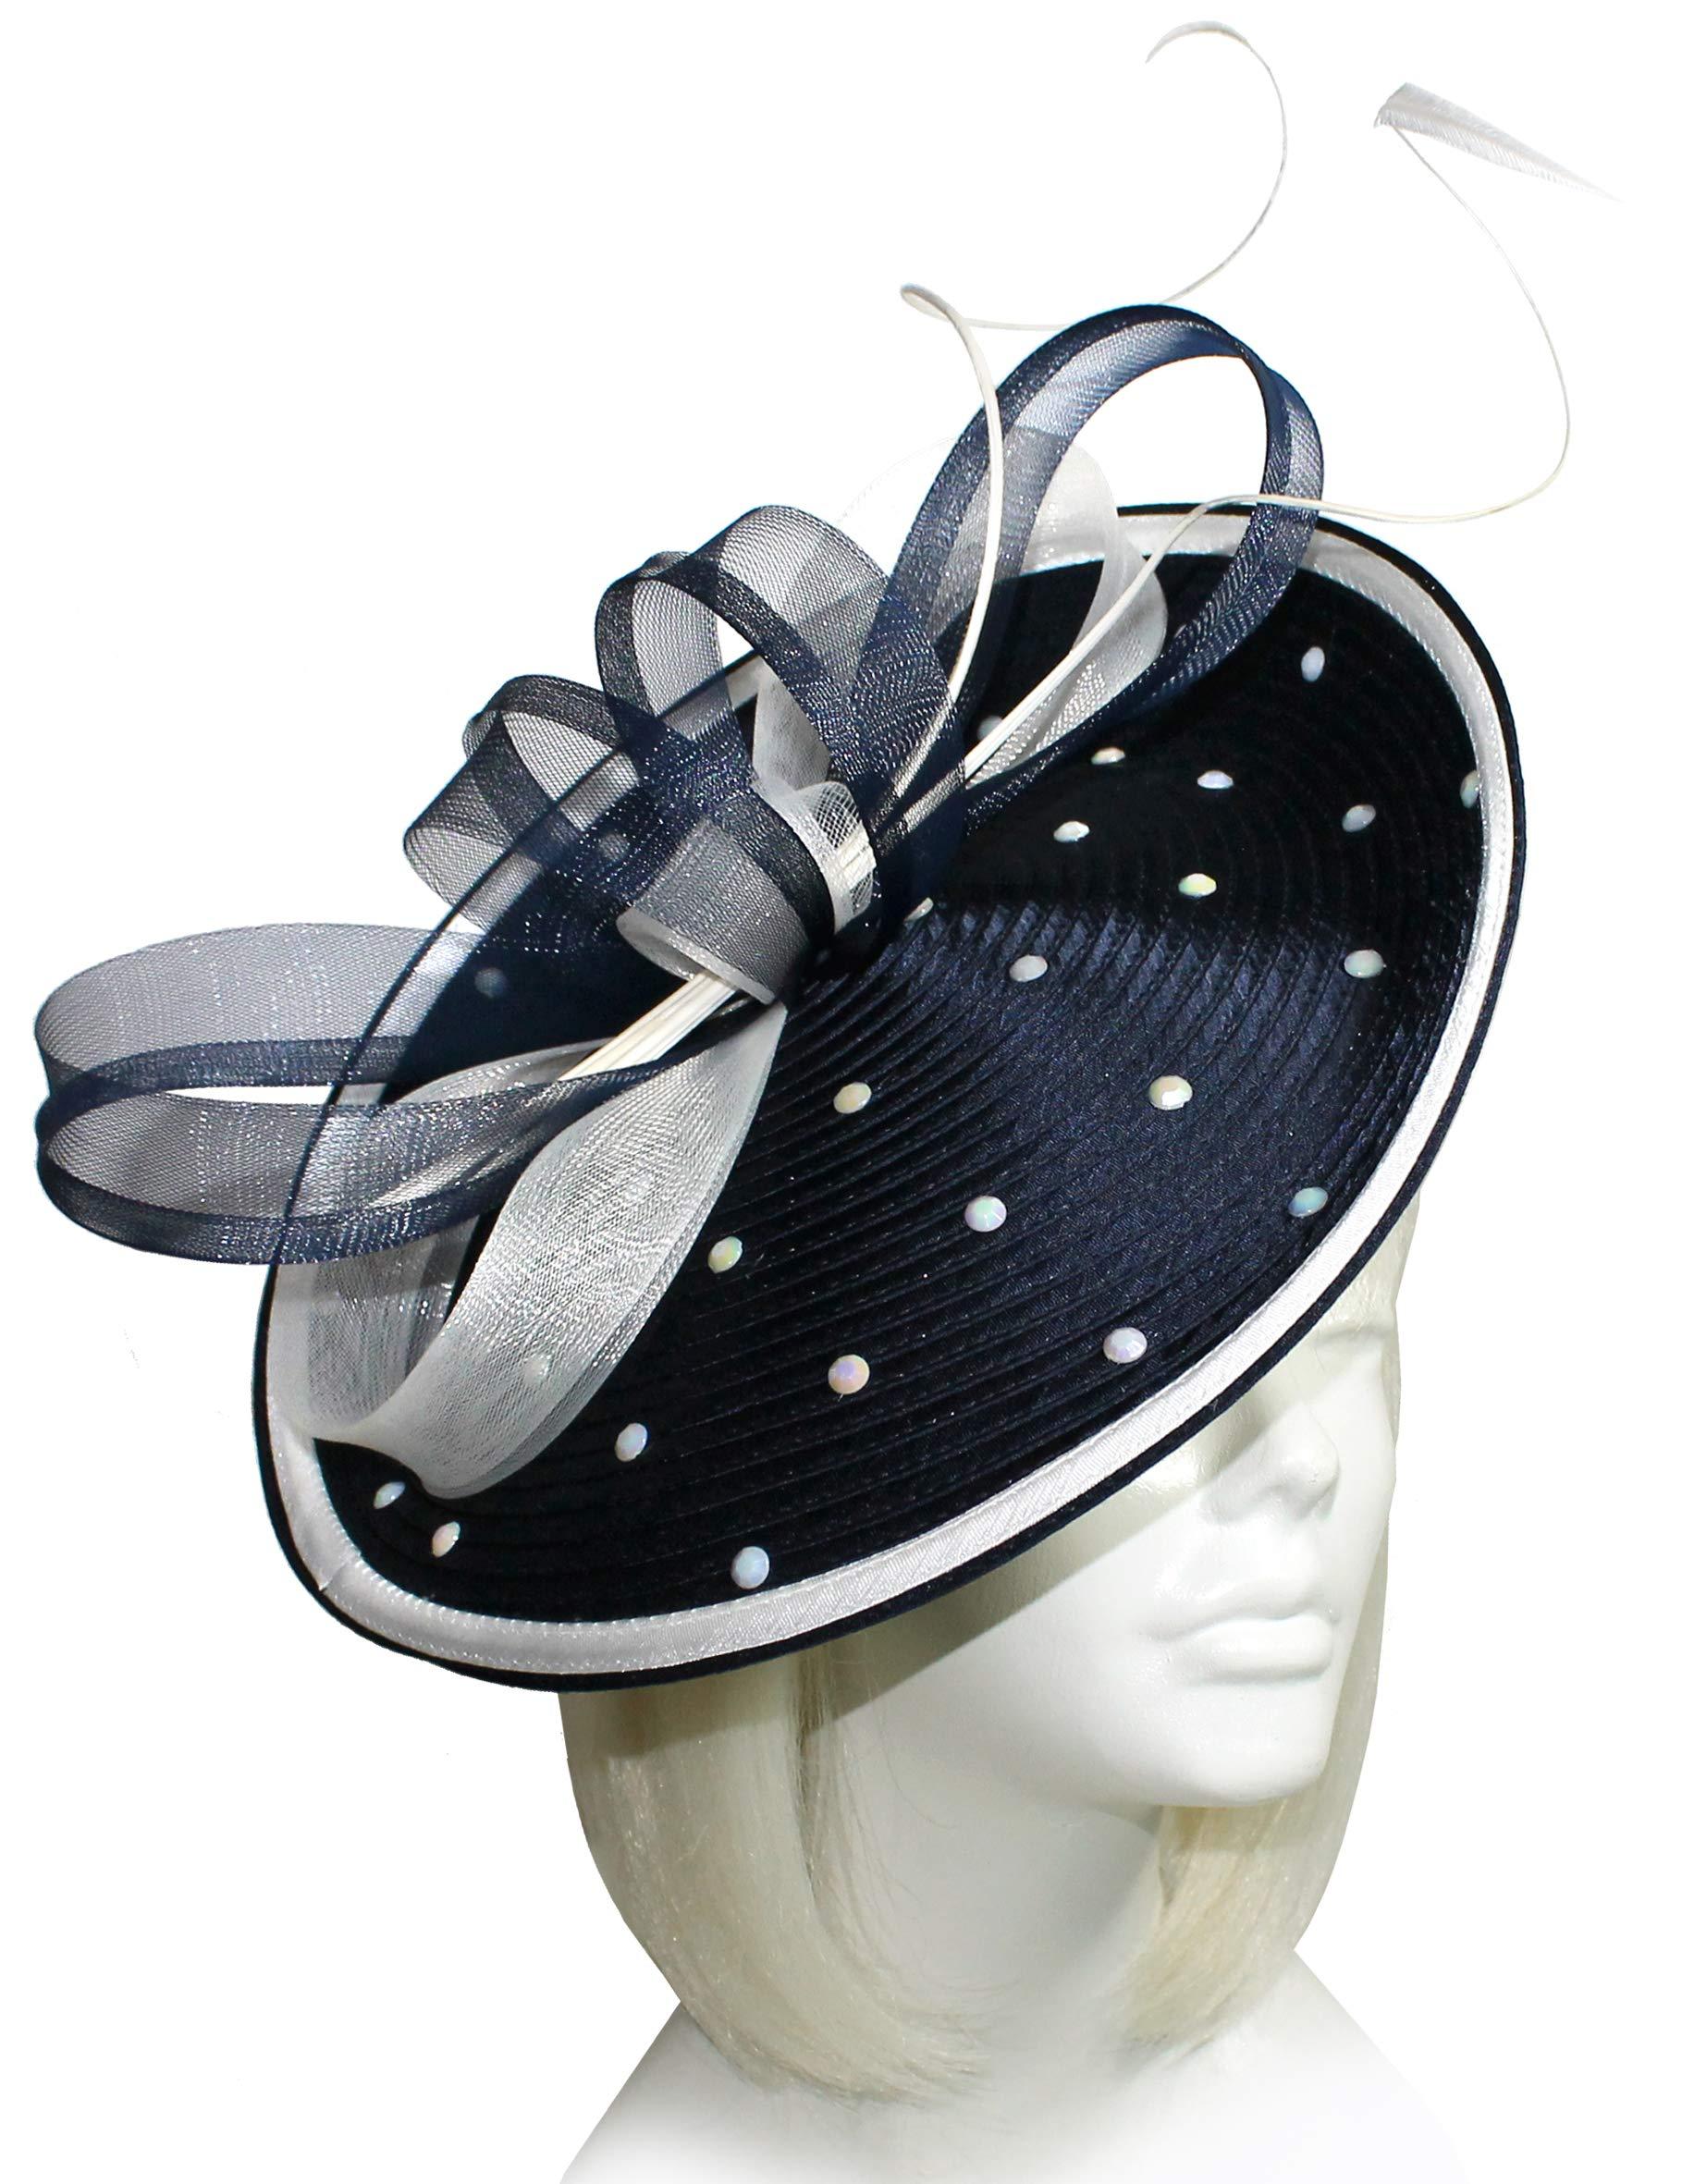 Mr. Song Millinery All-Season Profile Dish Headband Fascinator AF98 Navy Blue/White